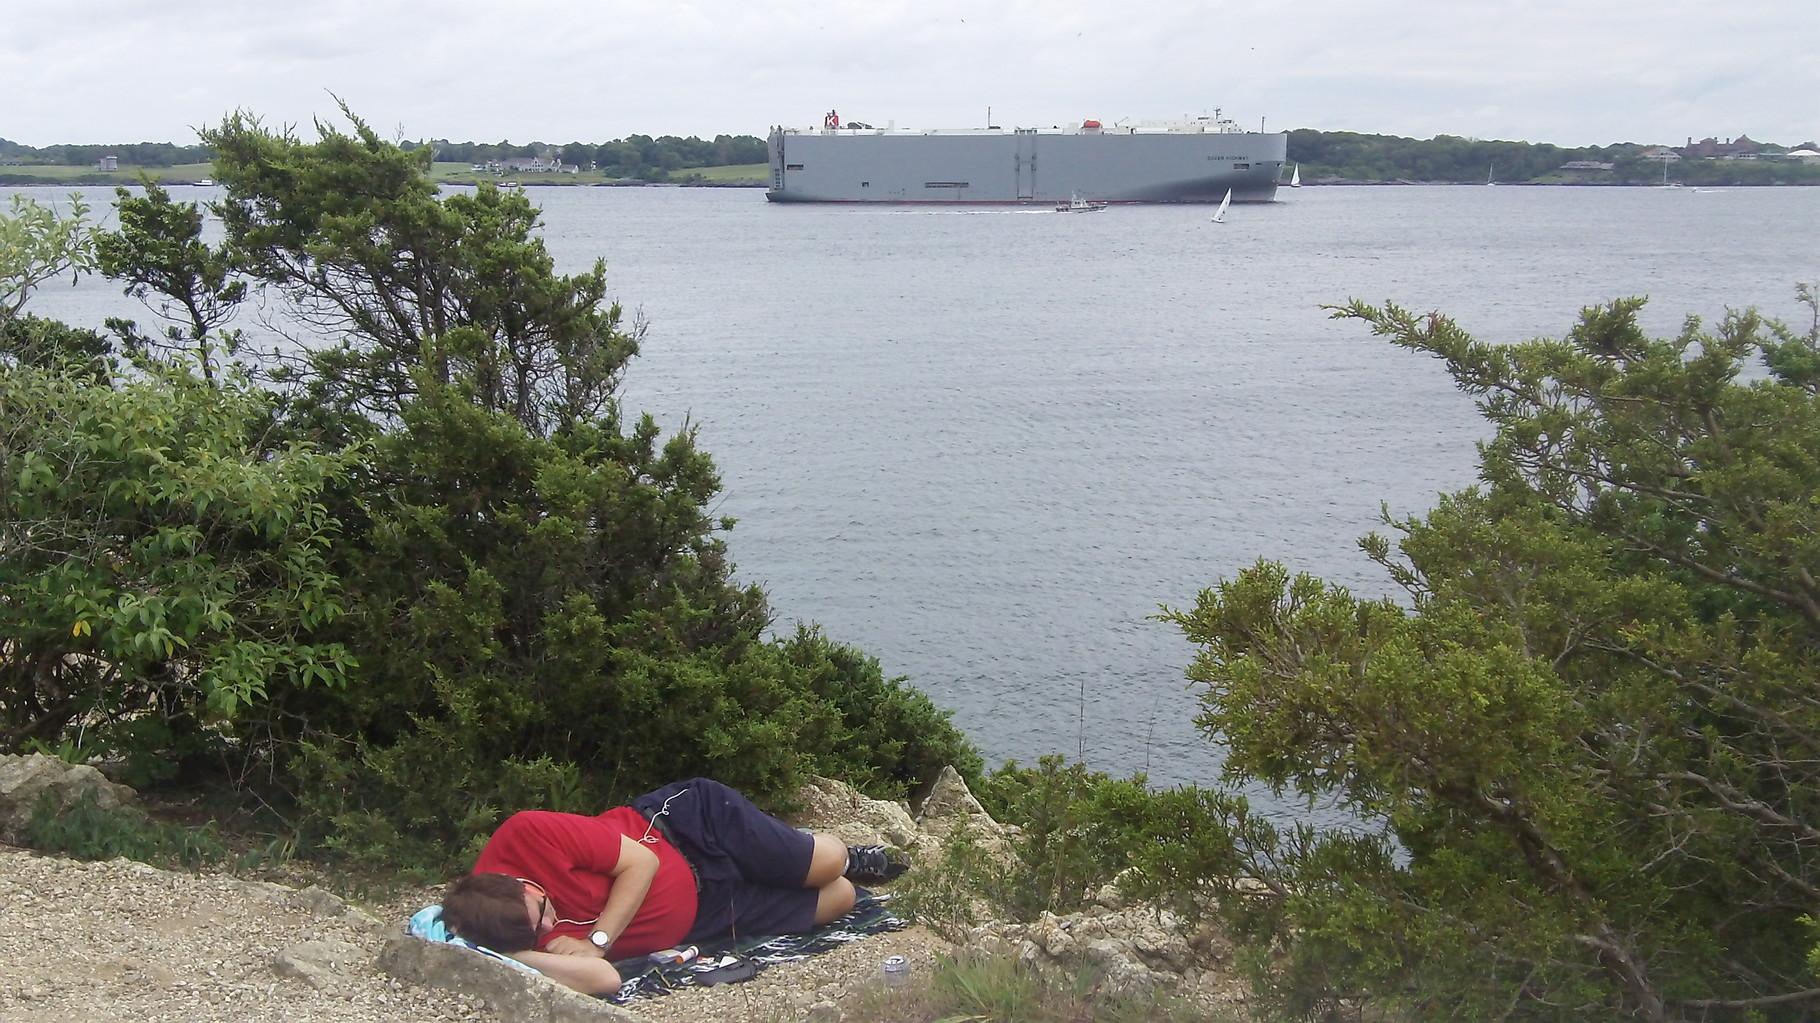 John relaxes in Jamestown